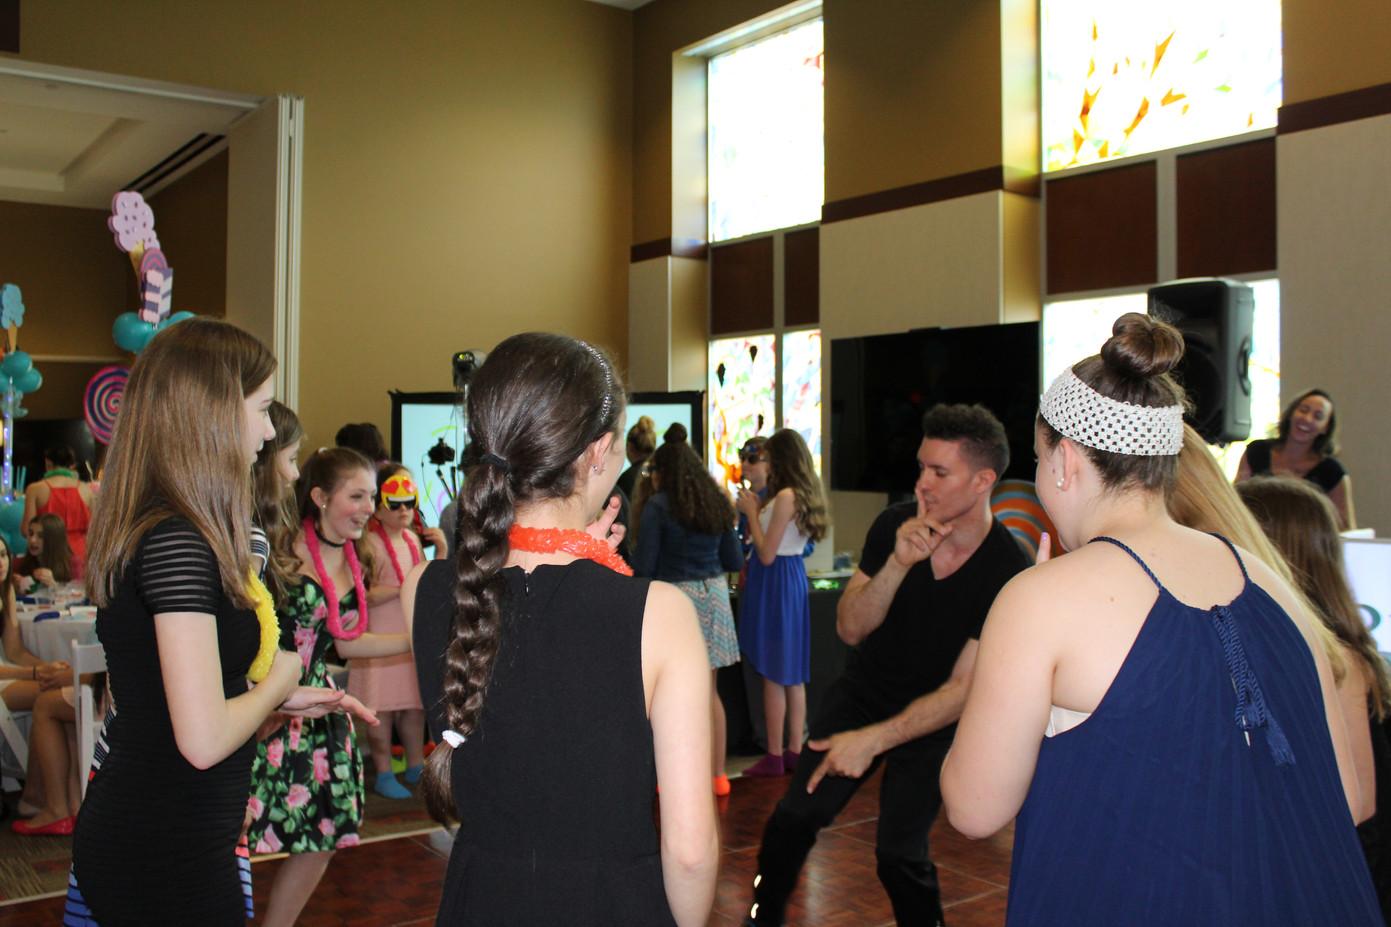 Motivational-Dancer-For-Event.JPG